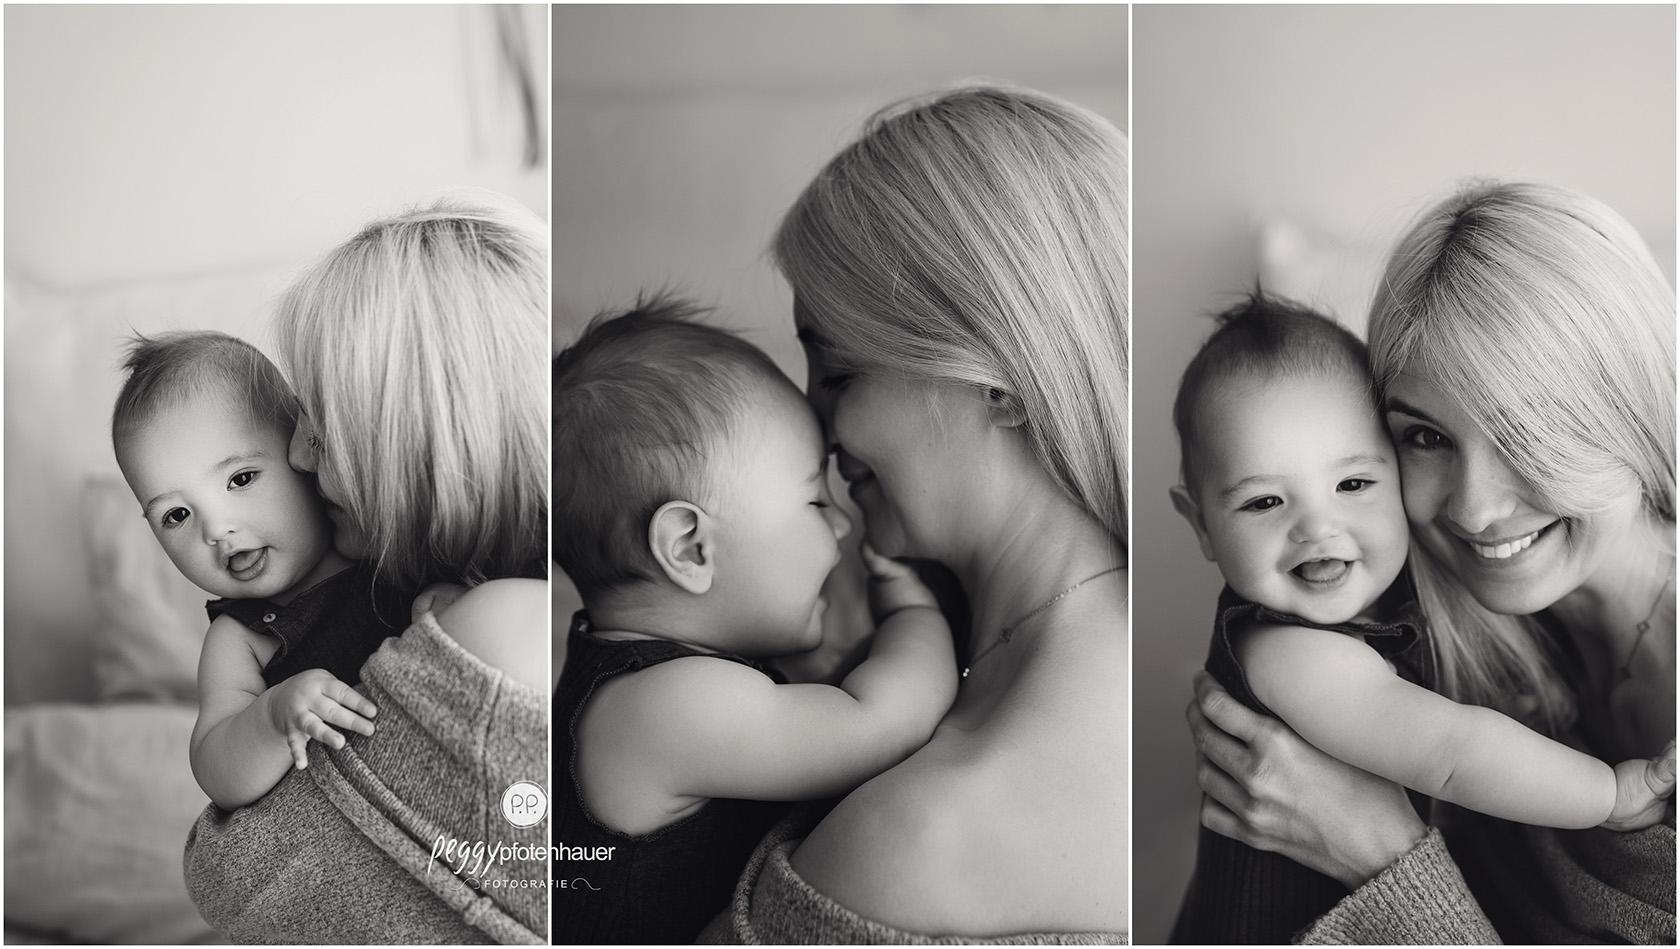 Babyfotografie 6 Monate